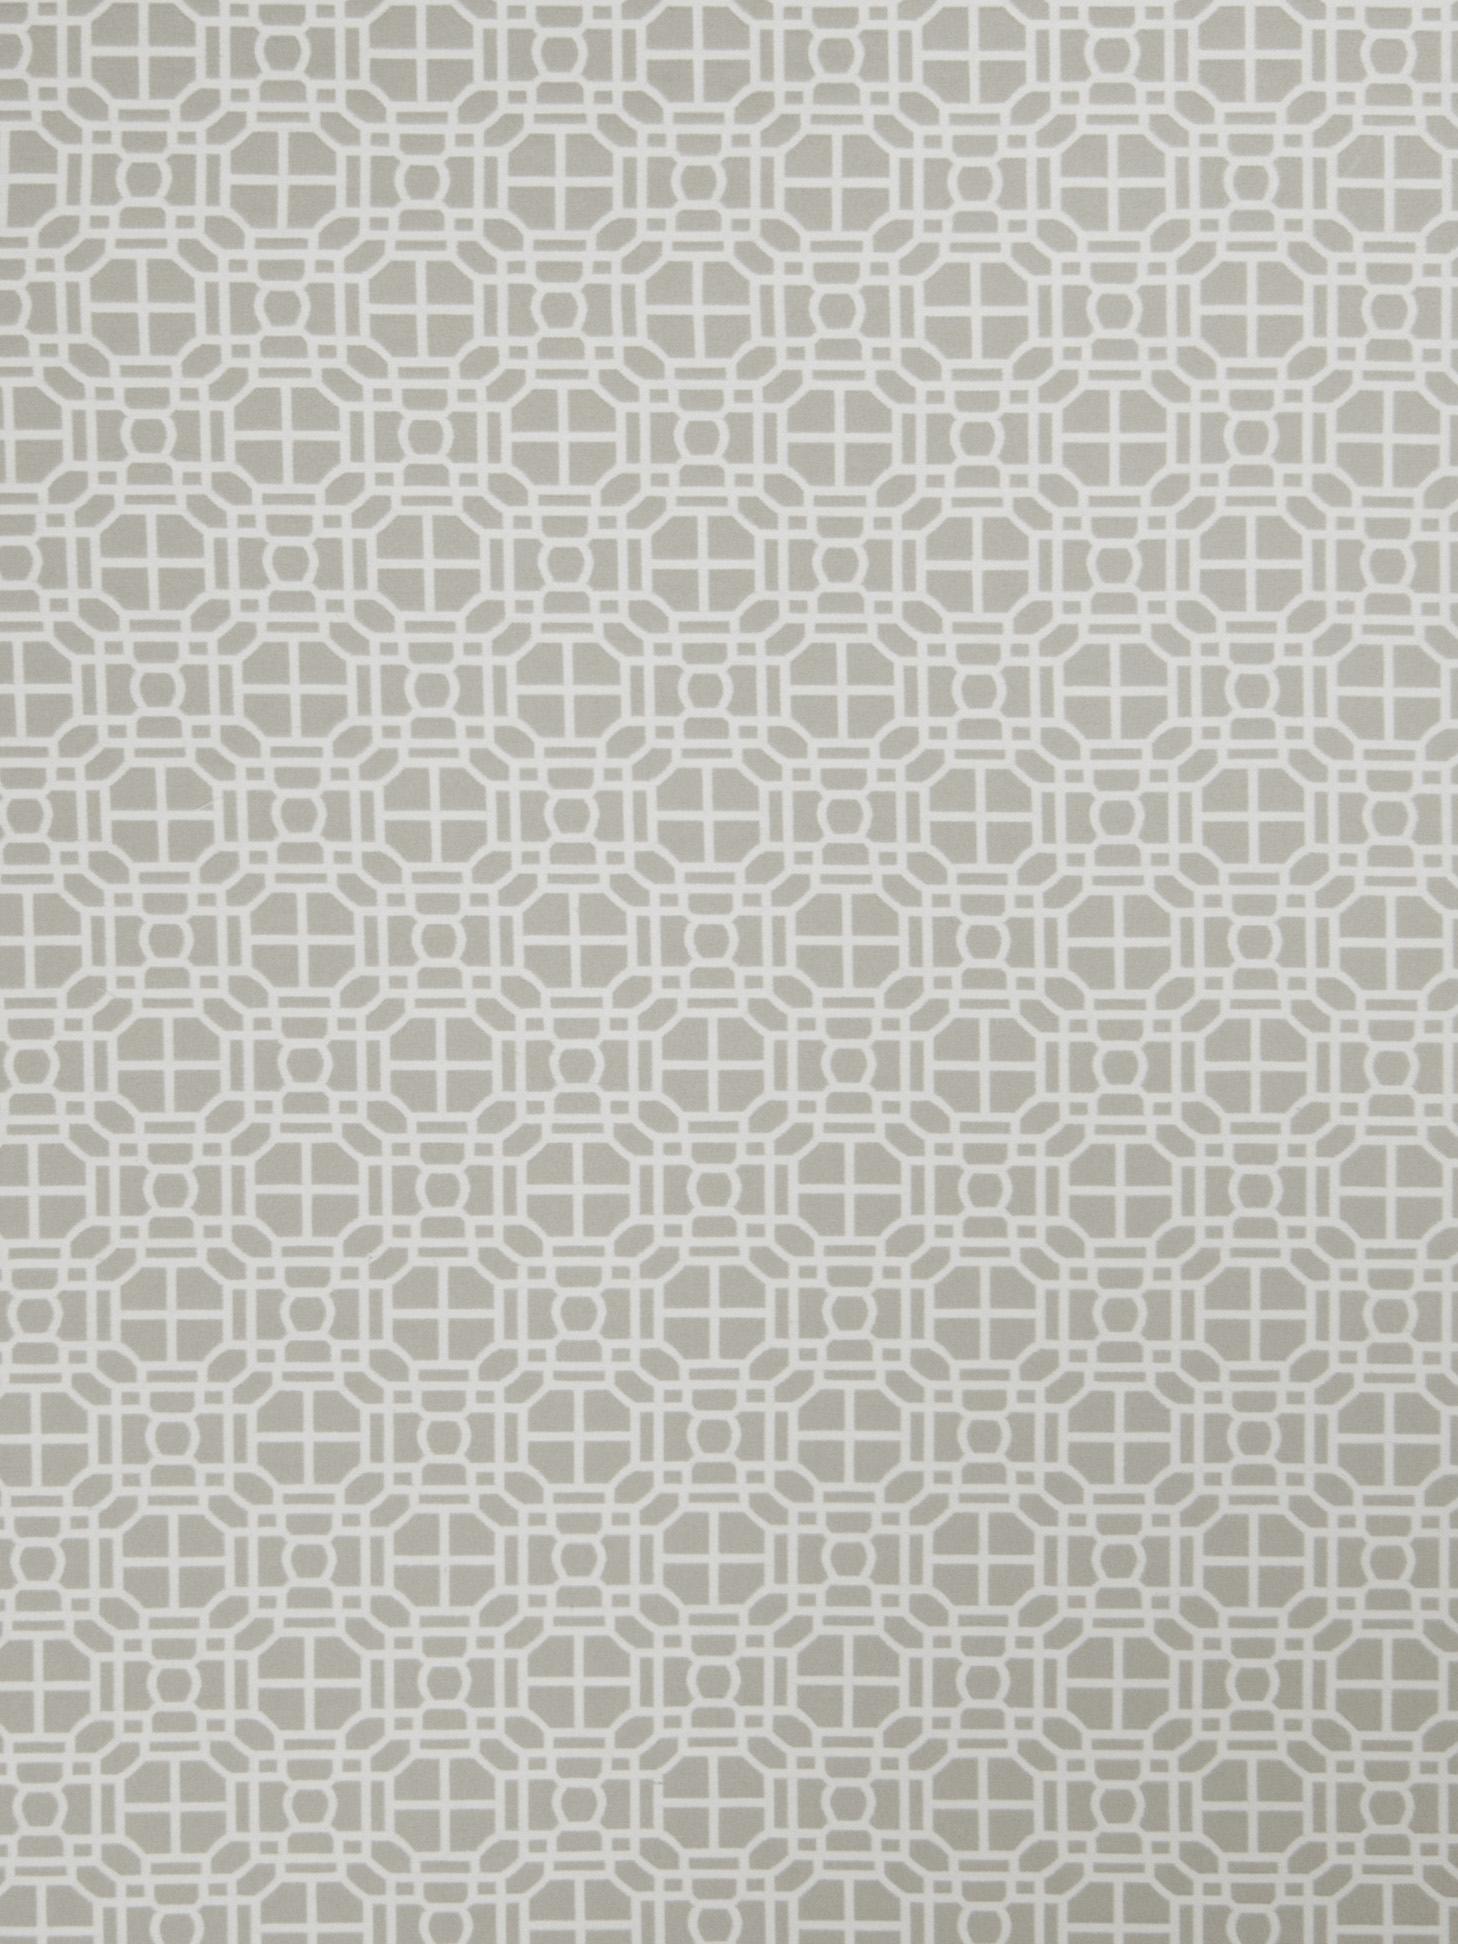 Upholstery Fabric- Jaclyn Smith Geo Dove Gray | JOANN